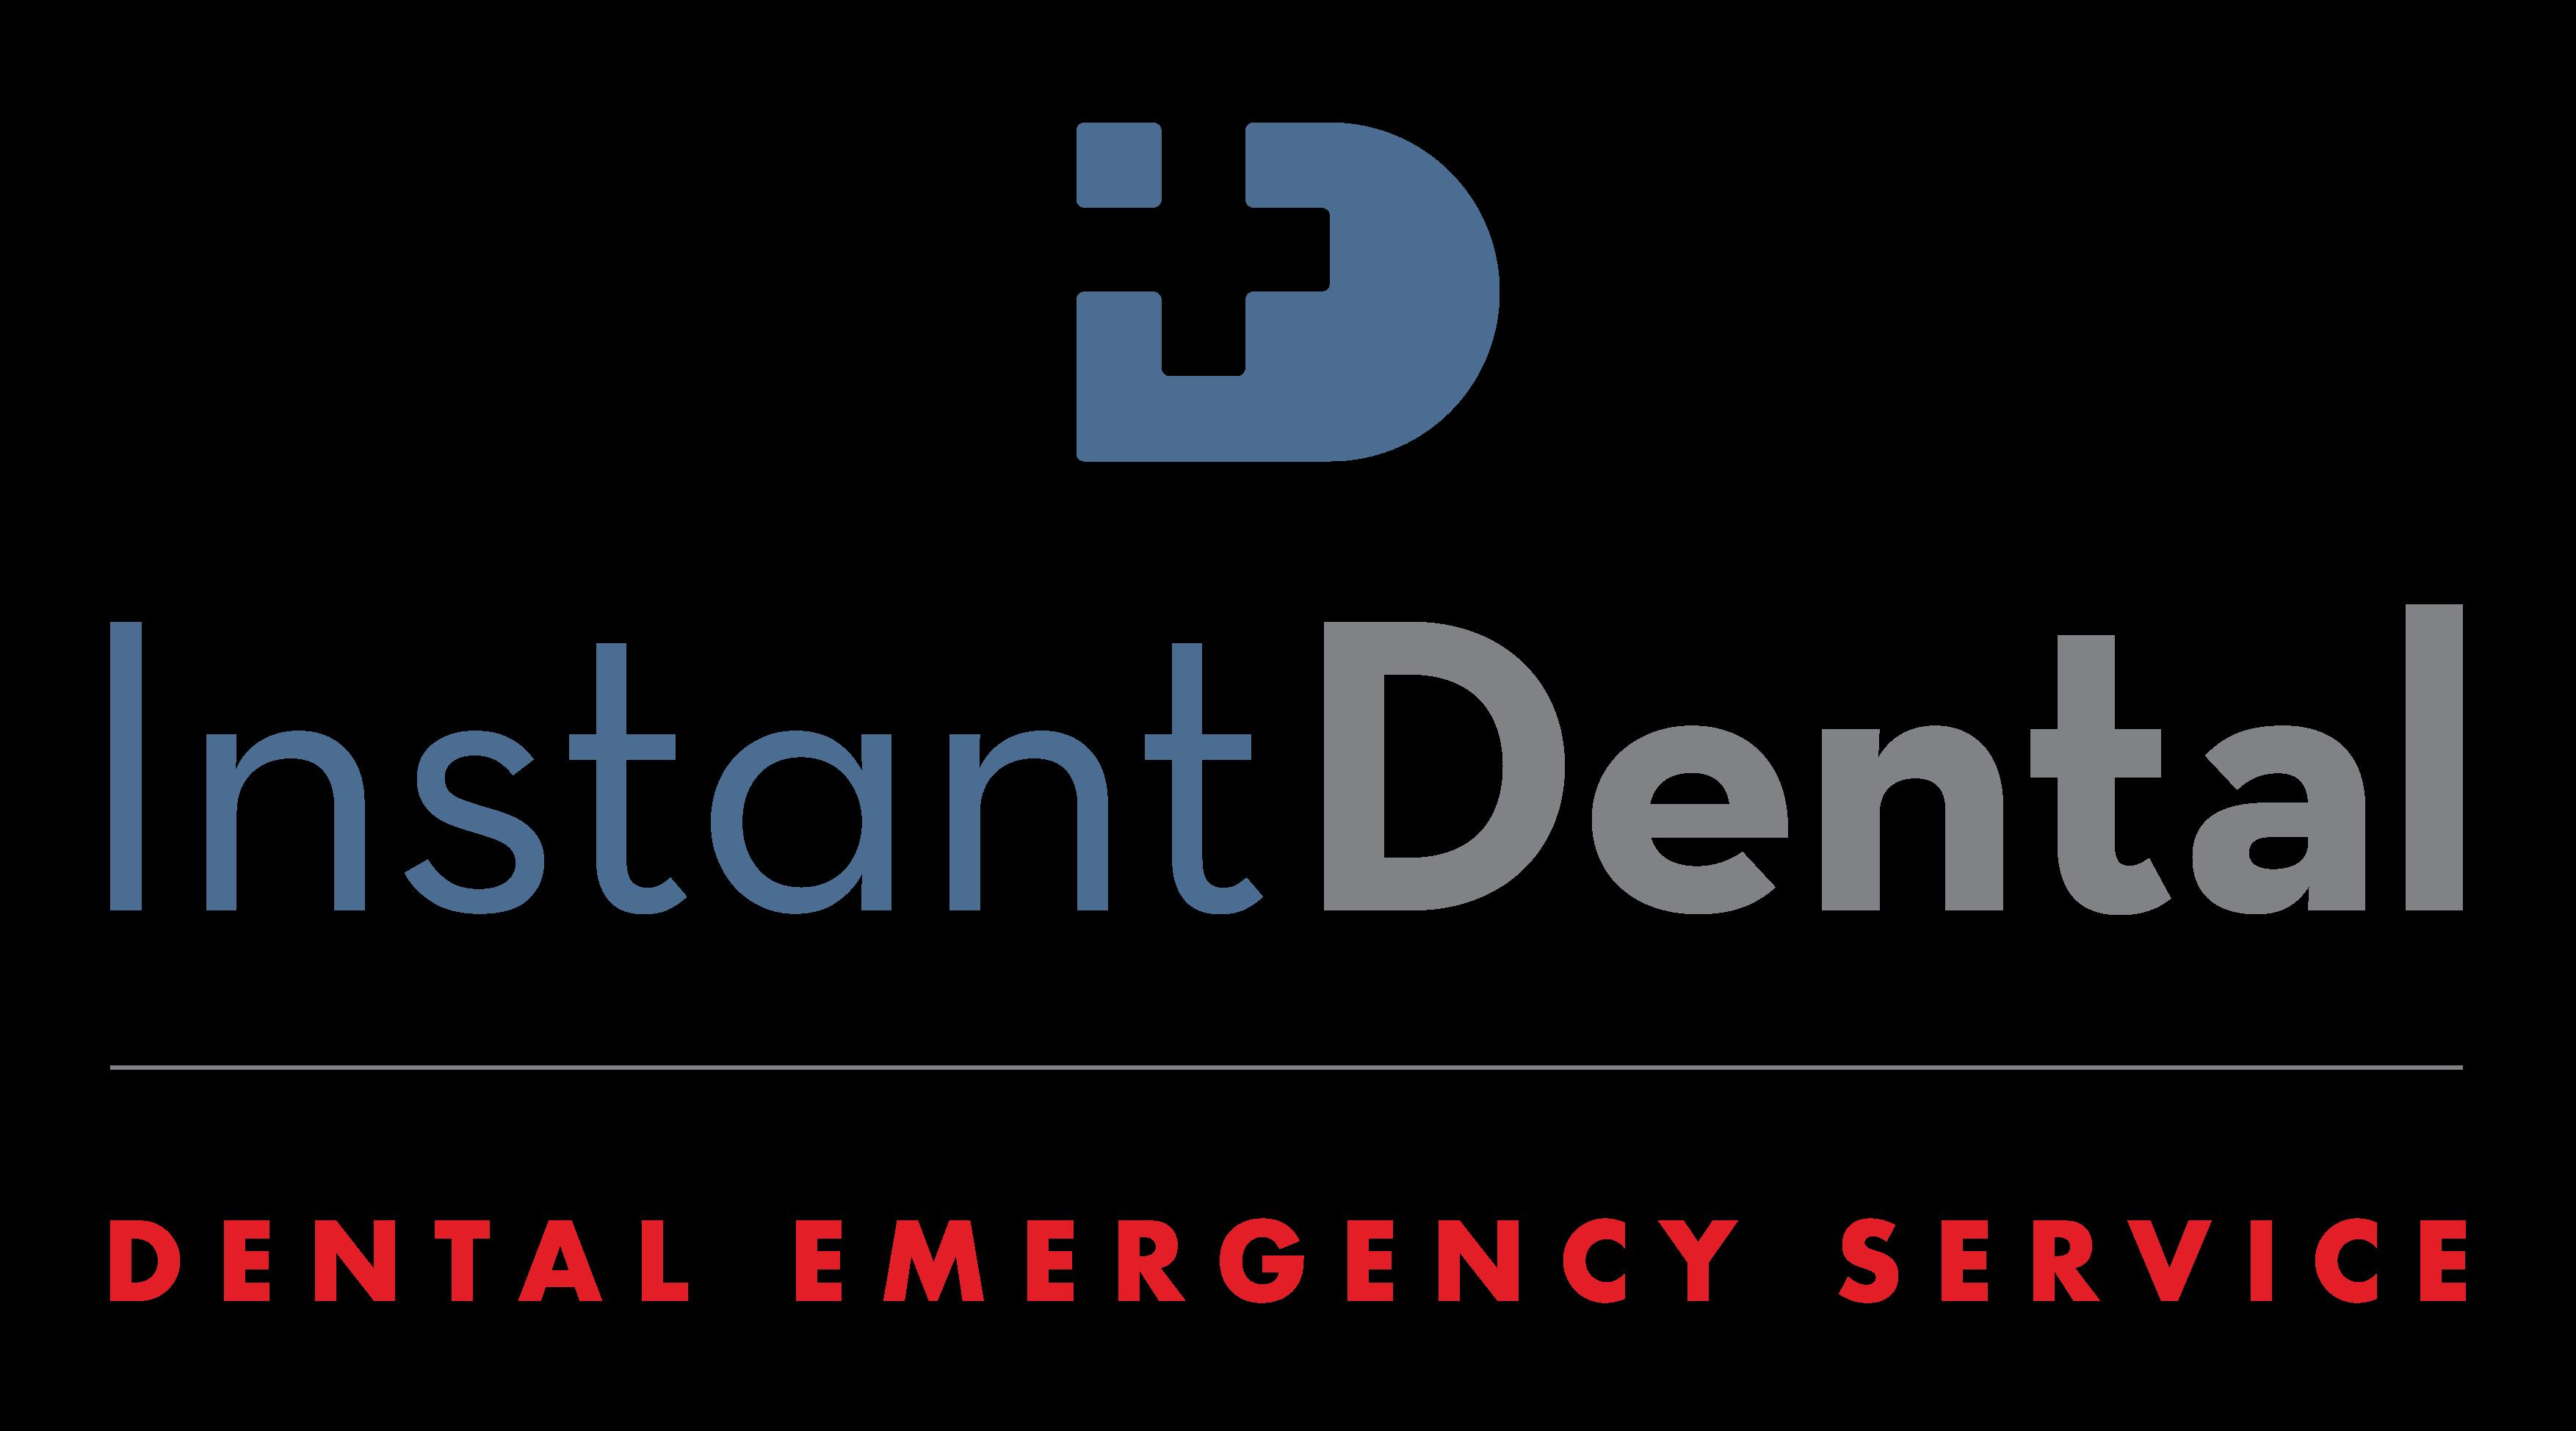 InstantDental : Dental Emergency Service